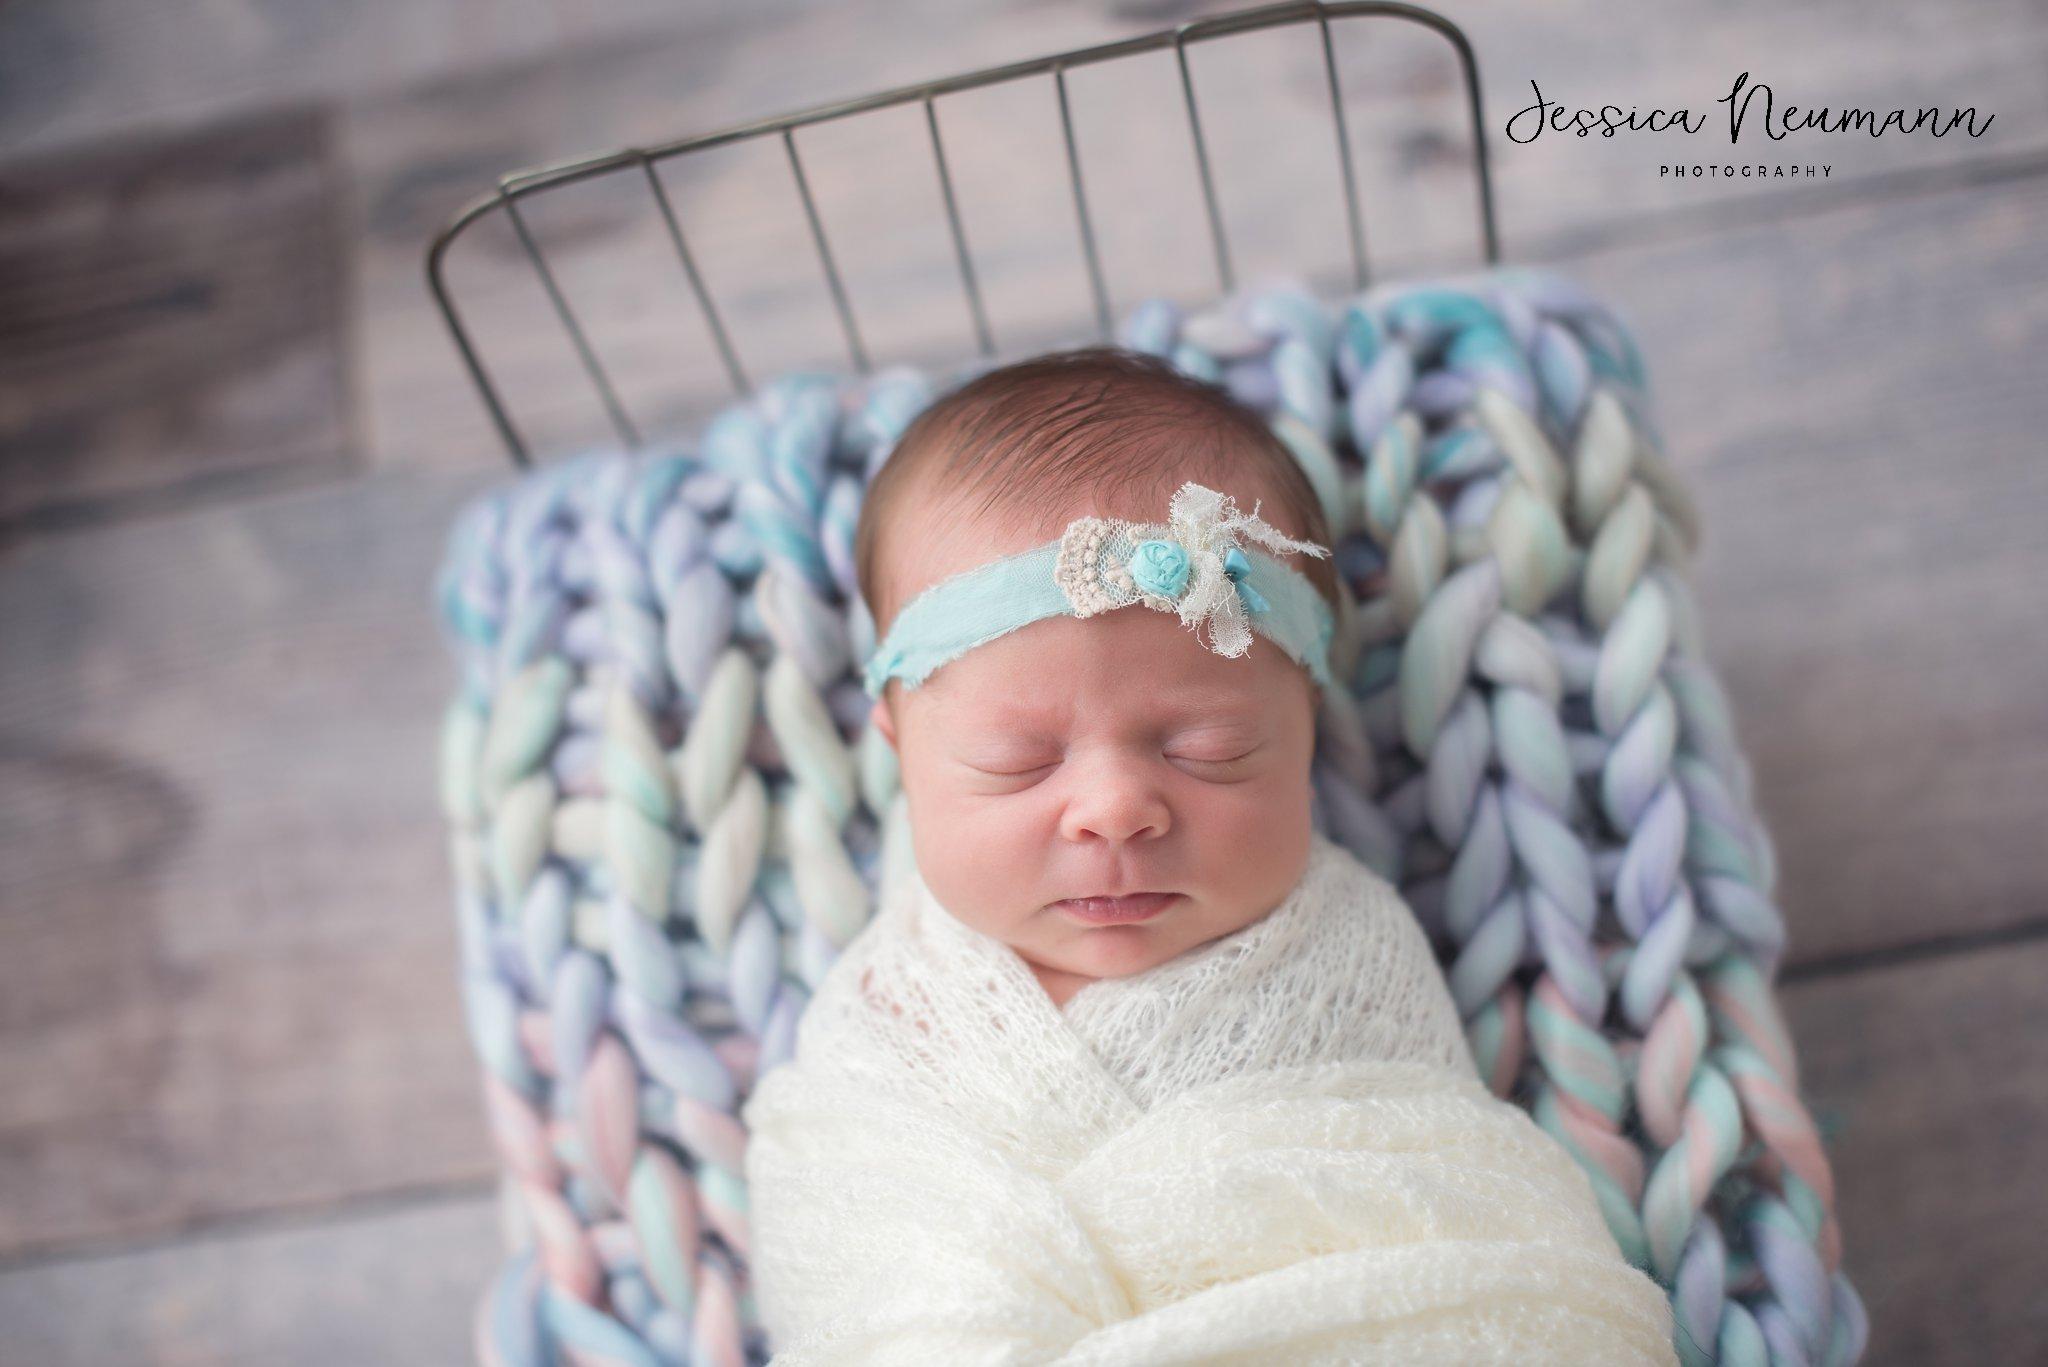 Newborn girl with handmade blanket, New Market, MD